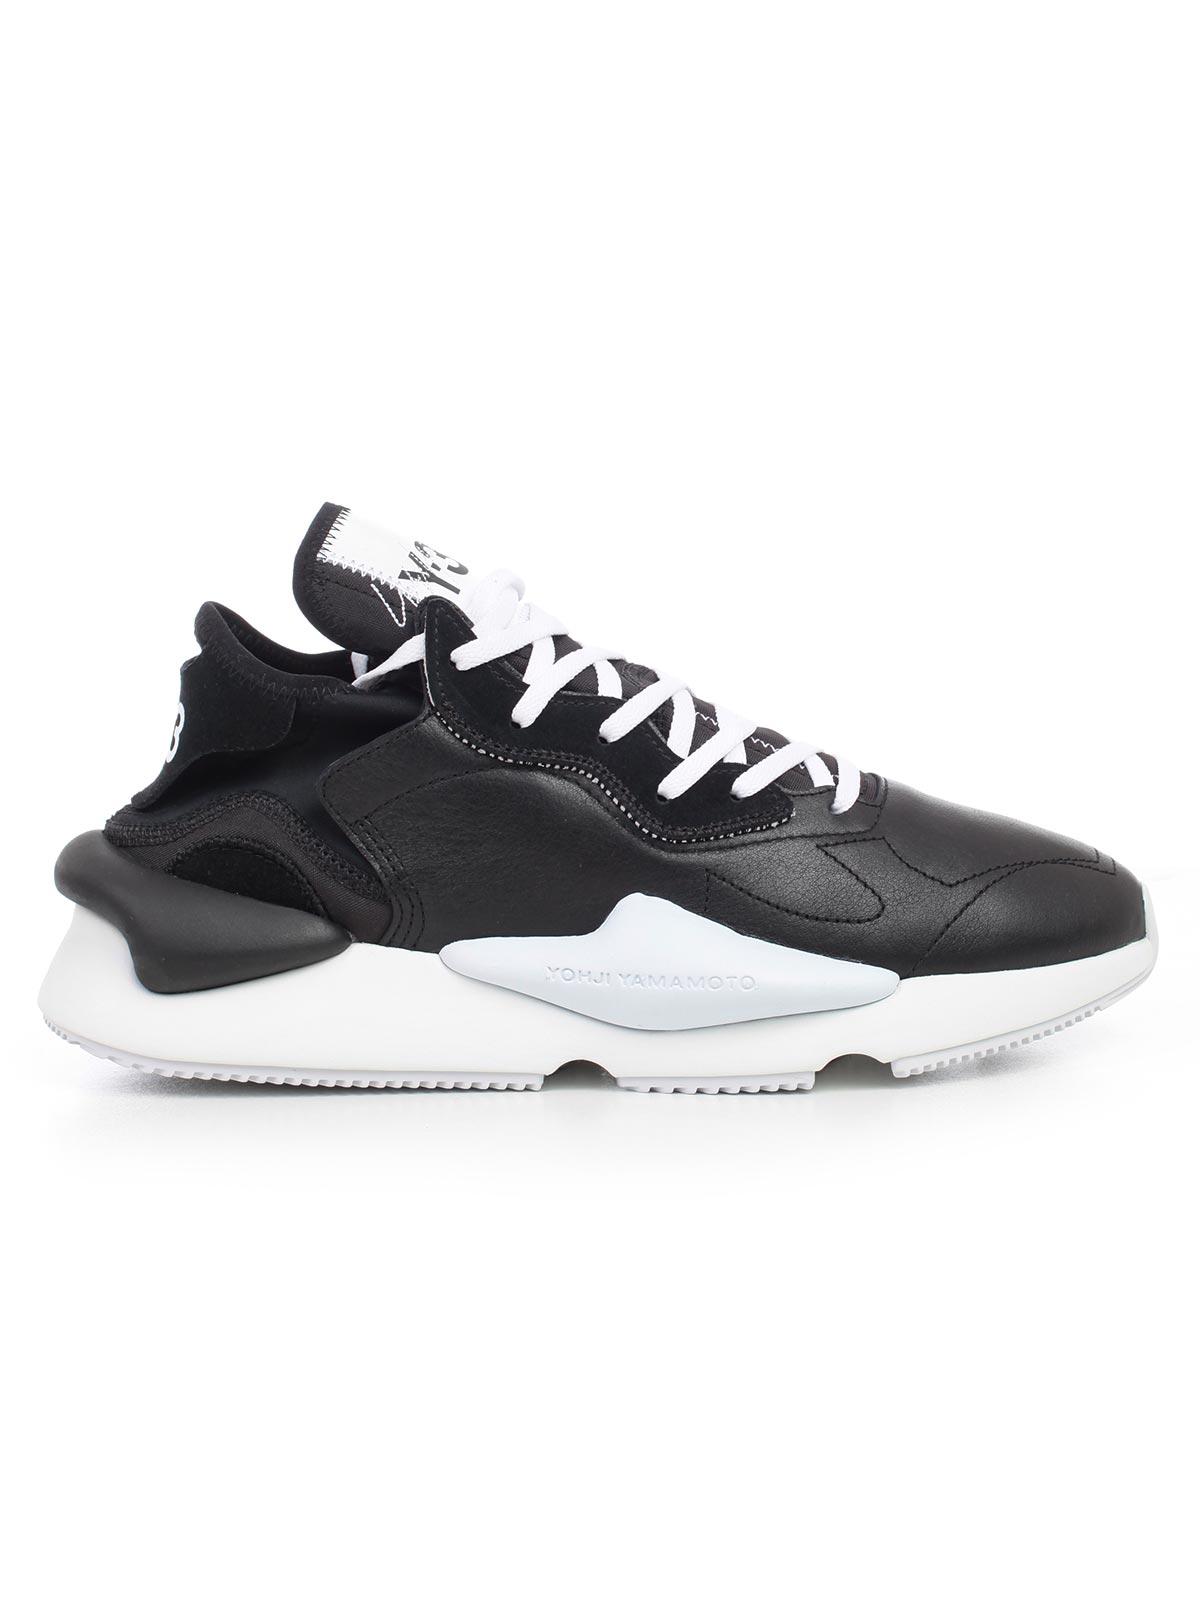 e7b3dda6aac5f Y-3 Yohji Yamamoto Adidas Shoes F97415 - BLACK.Bernardelli Store ...